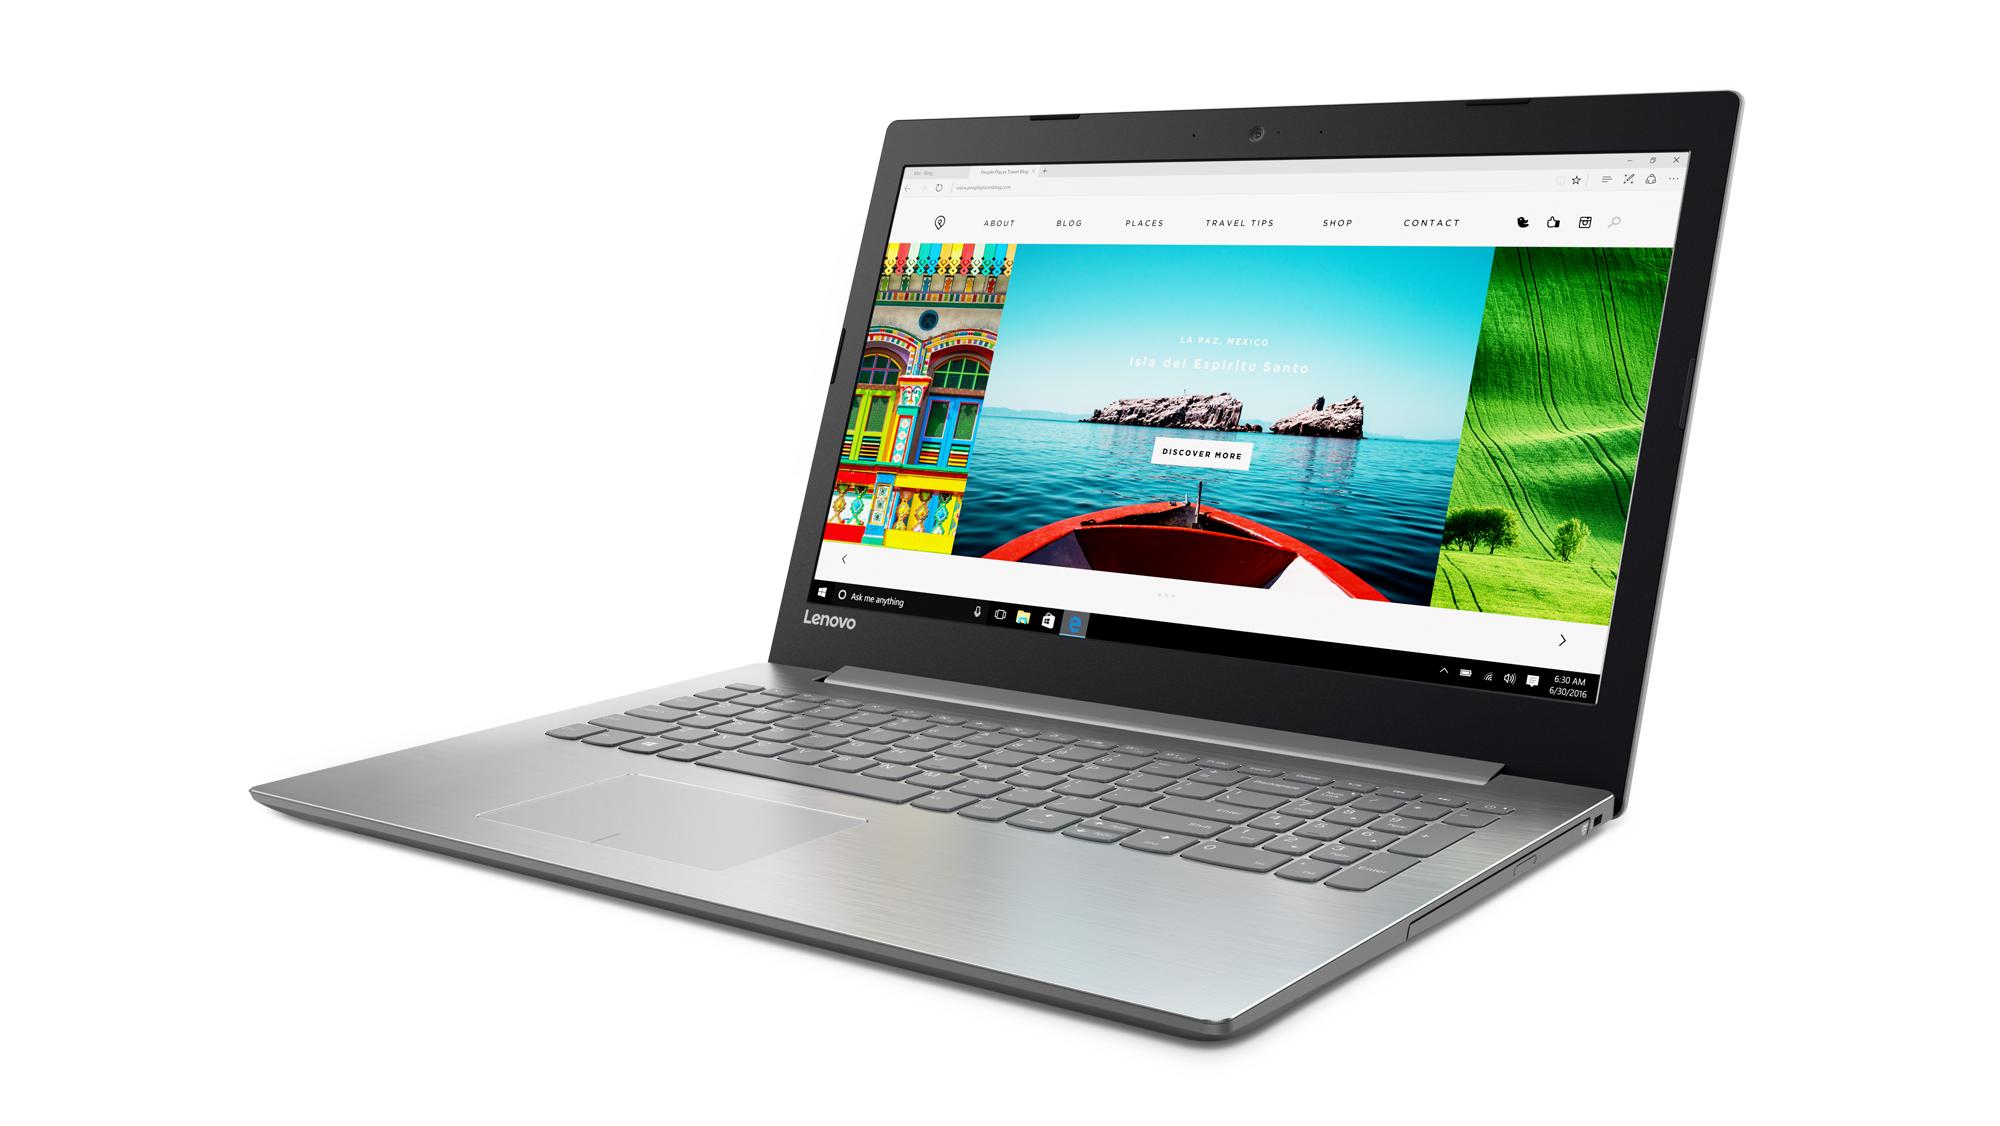 Lenovo IdeaPad 320 15.6 FHD TN AG/i5-7200U/8G/1TB+128G/NV4G/W10H/Šedá